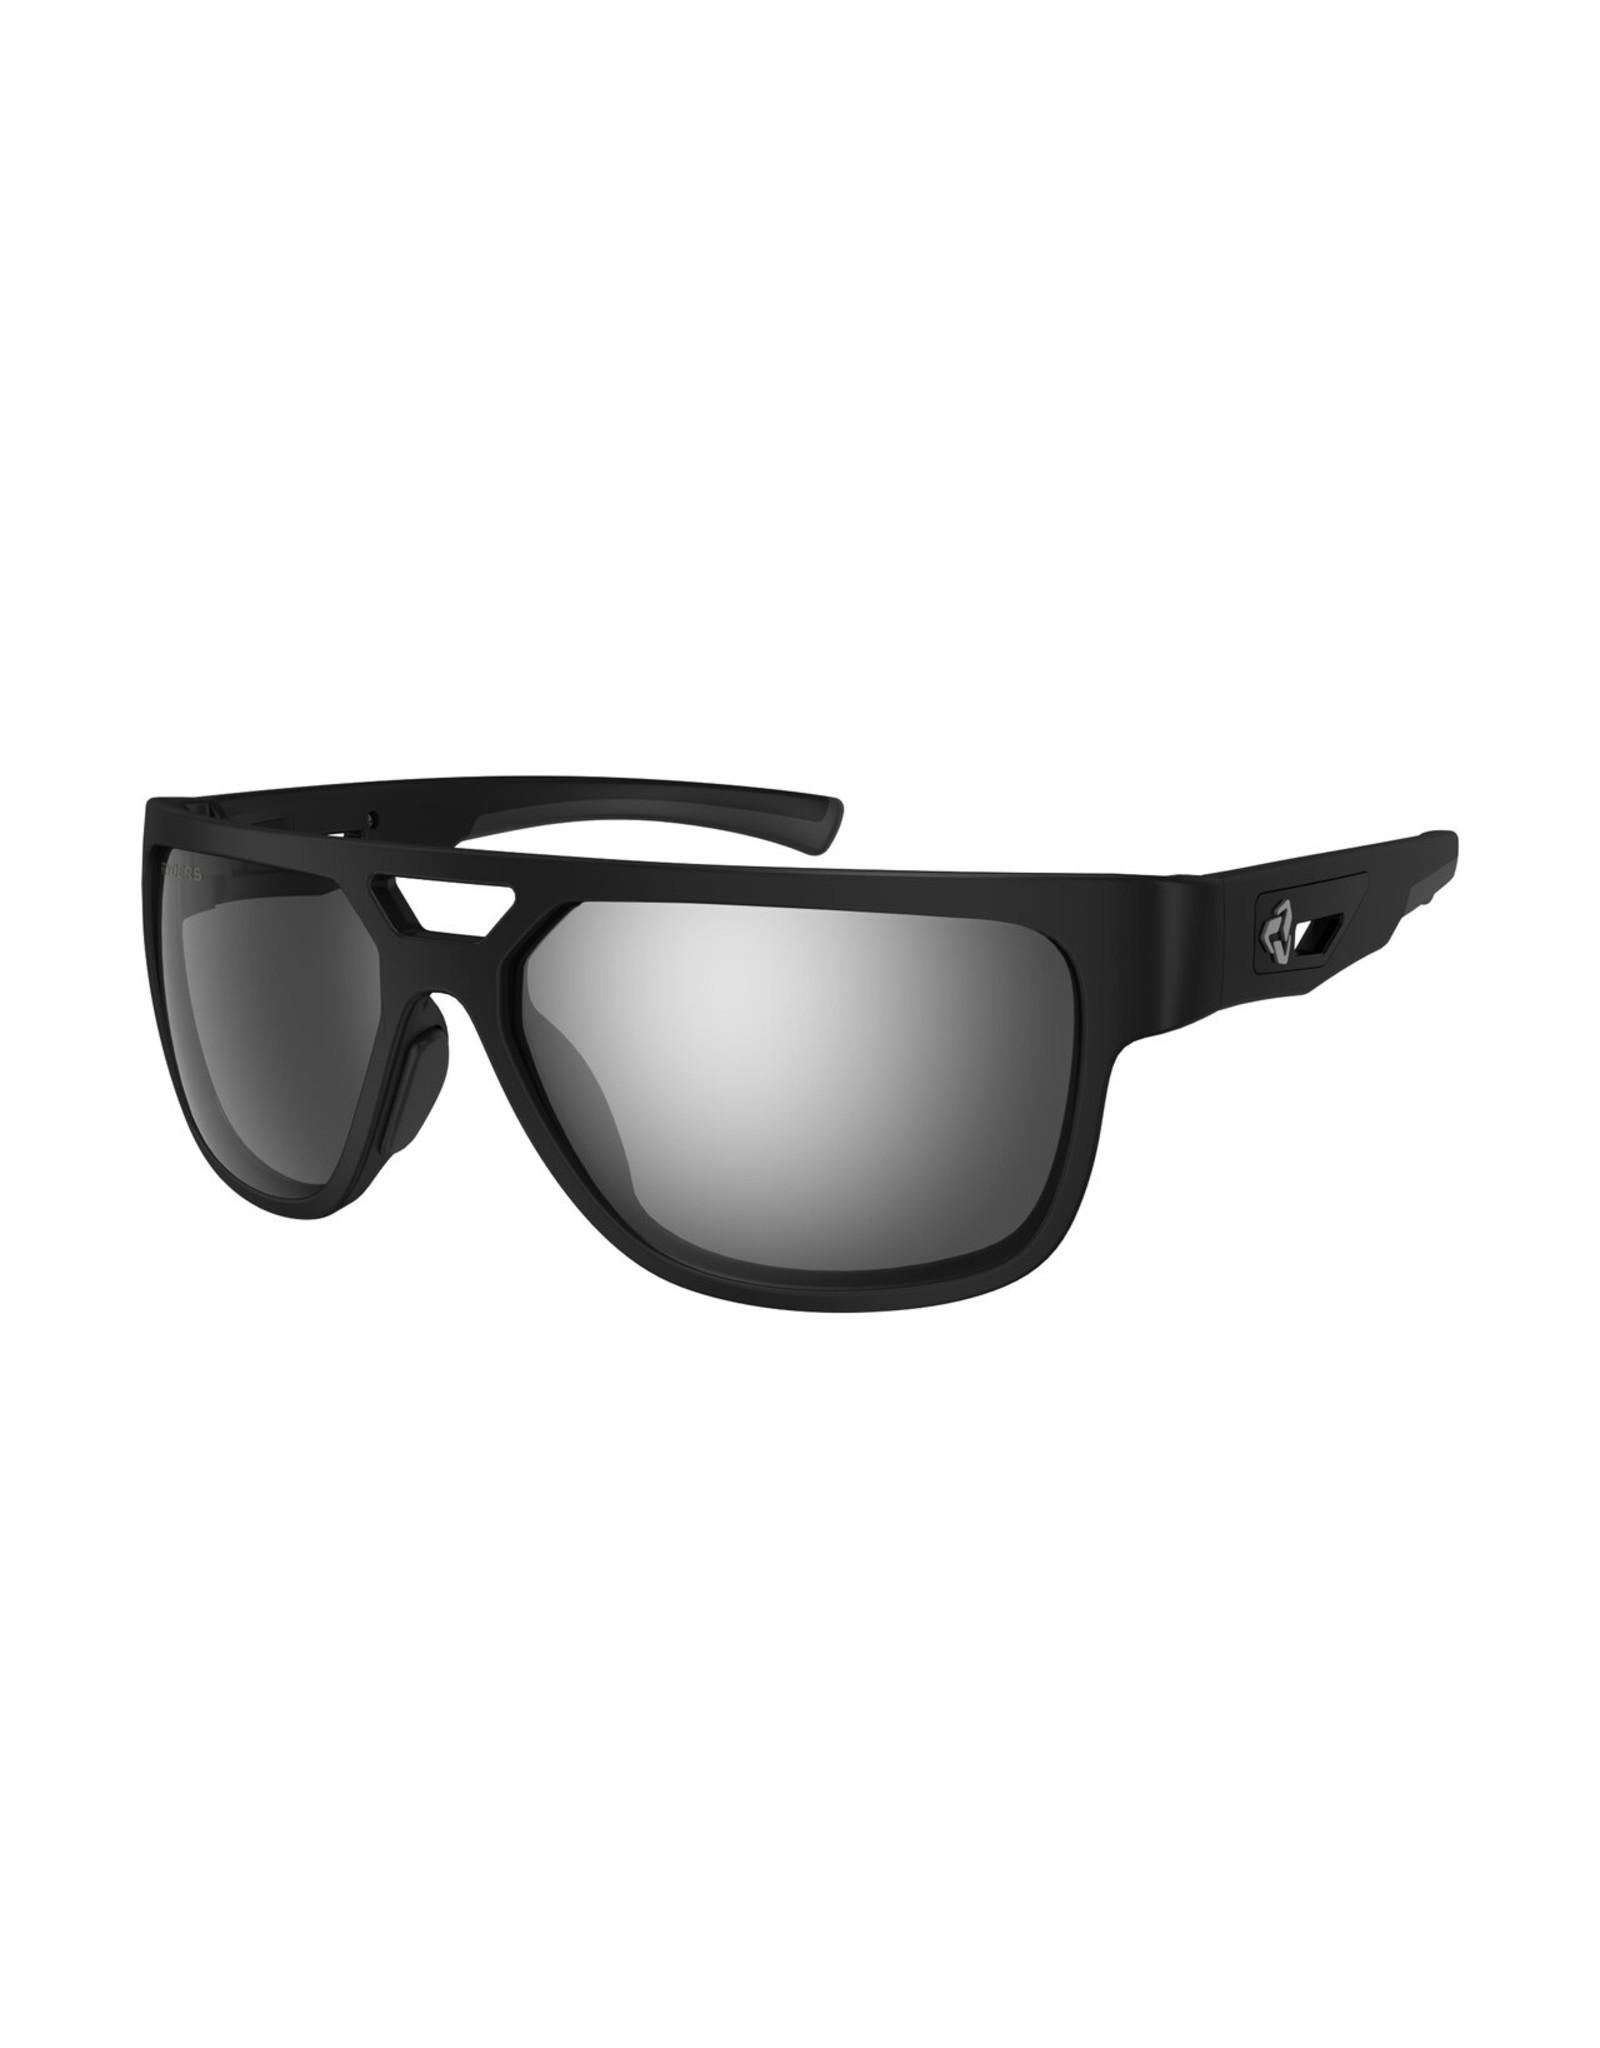 Ryders Eyewear - Cakewalk Polar Black/Grey Lens Silver FM